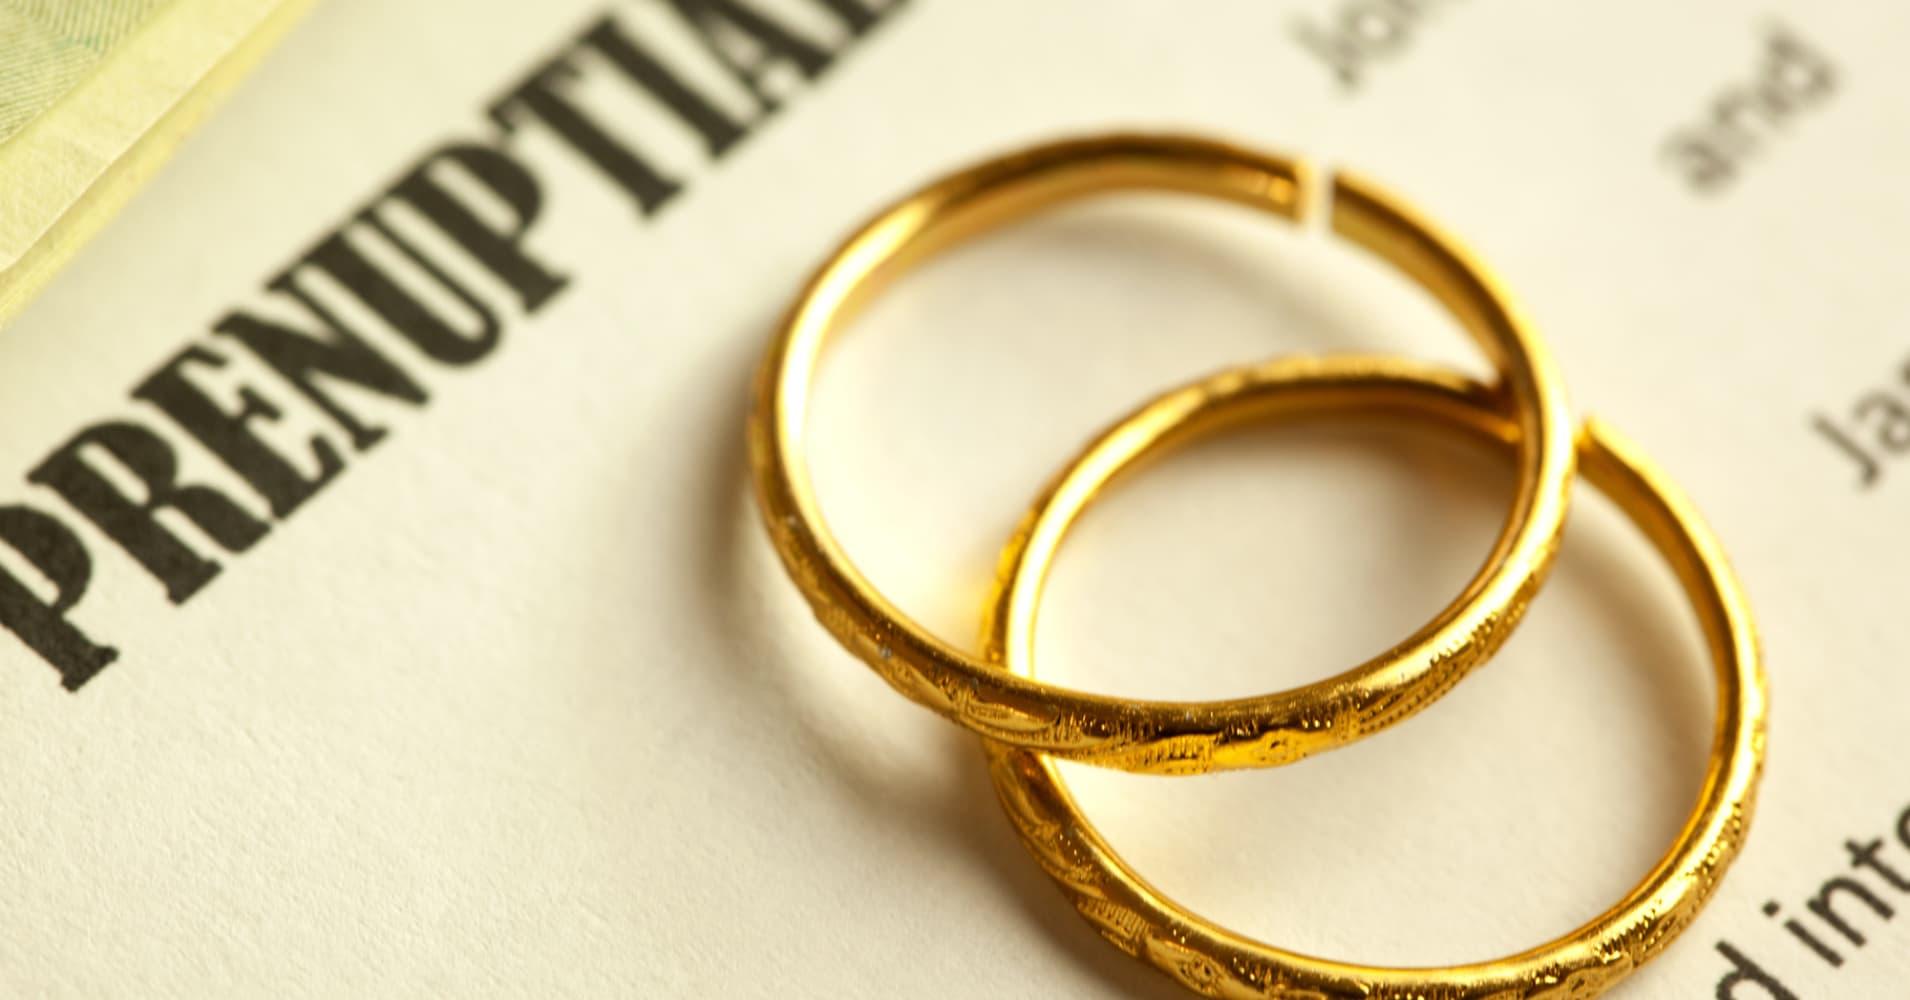 Couples sign social media prenups before 'I do!'